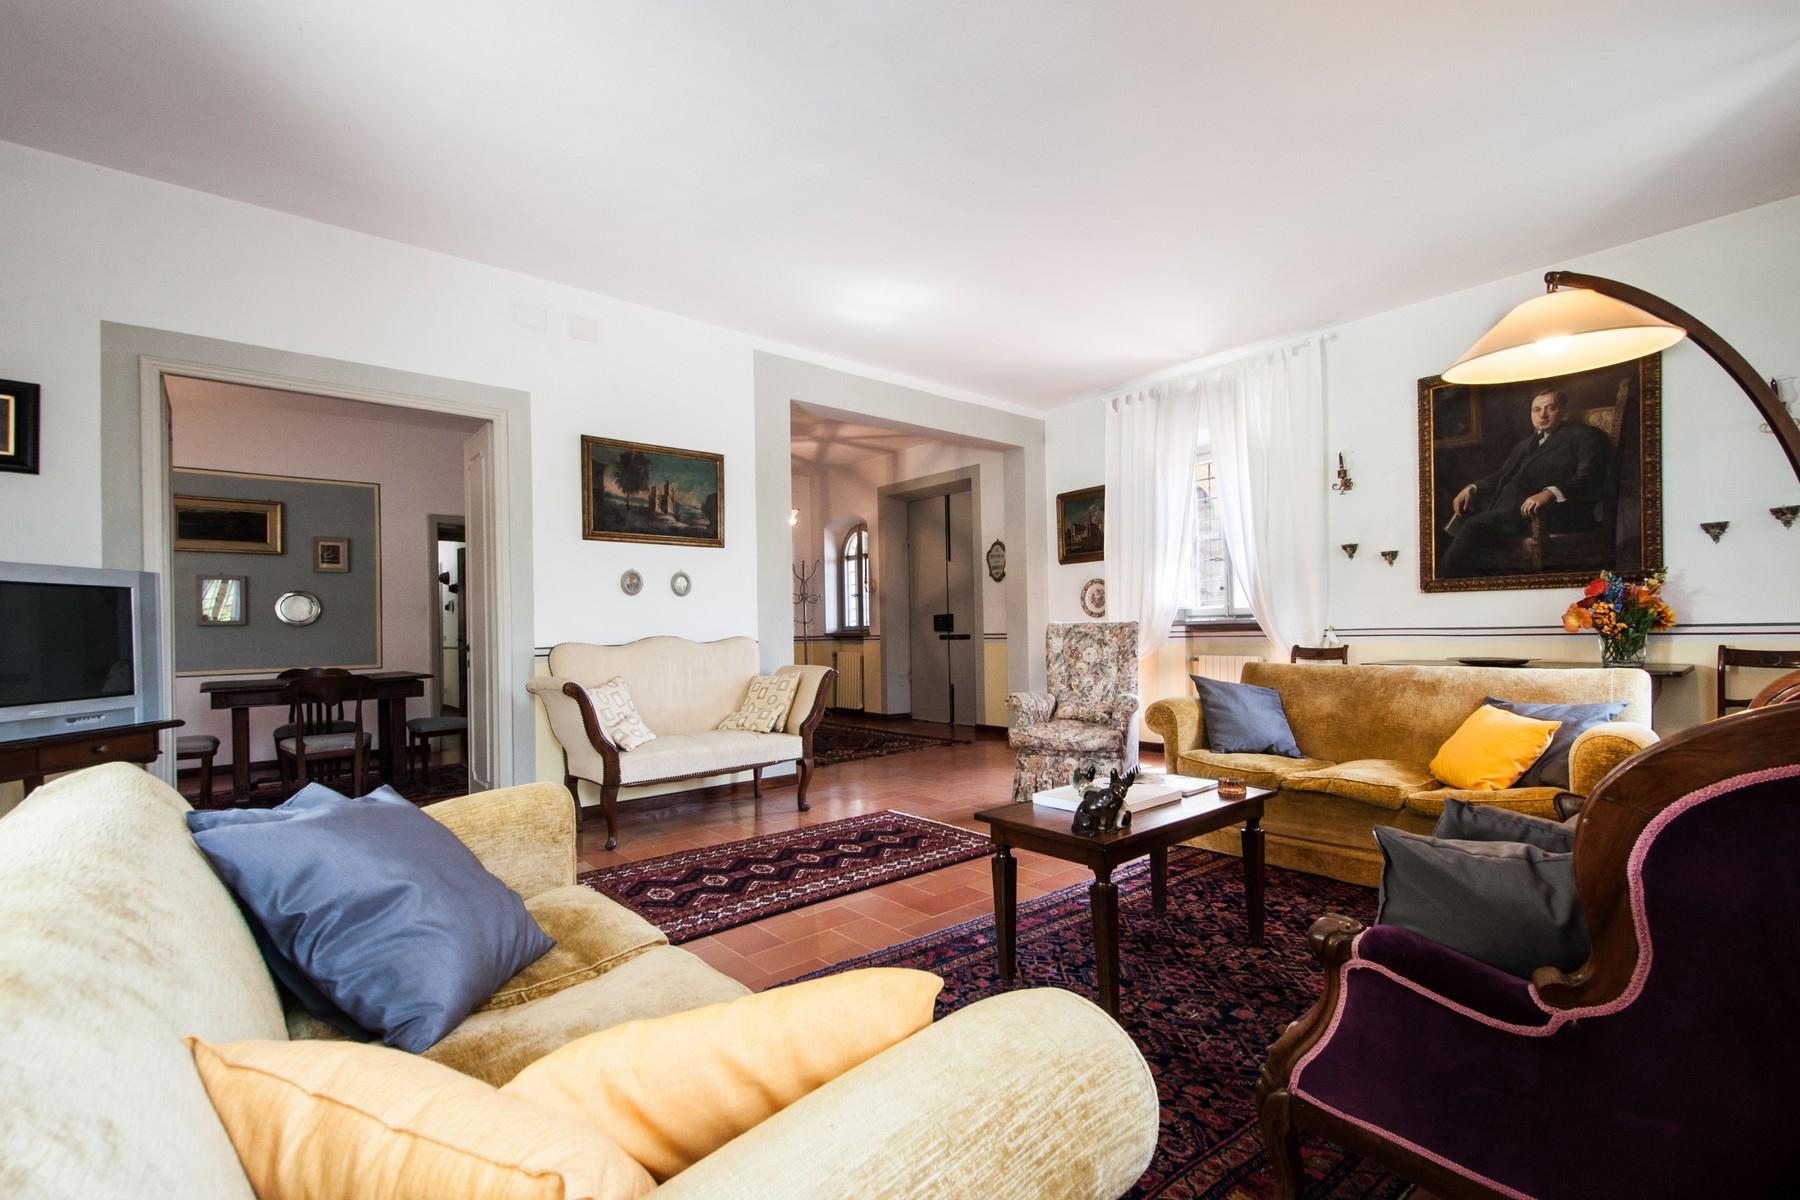 Villa in Vendita a Lucca: 5 locali, 400 mq - Foto 4